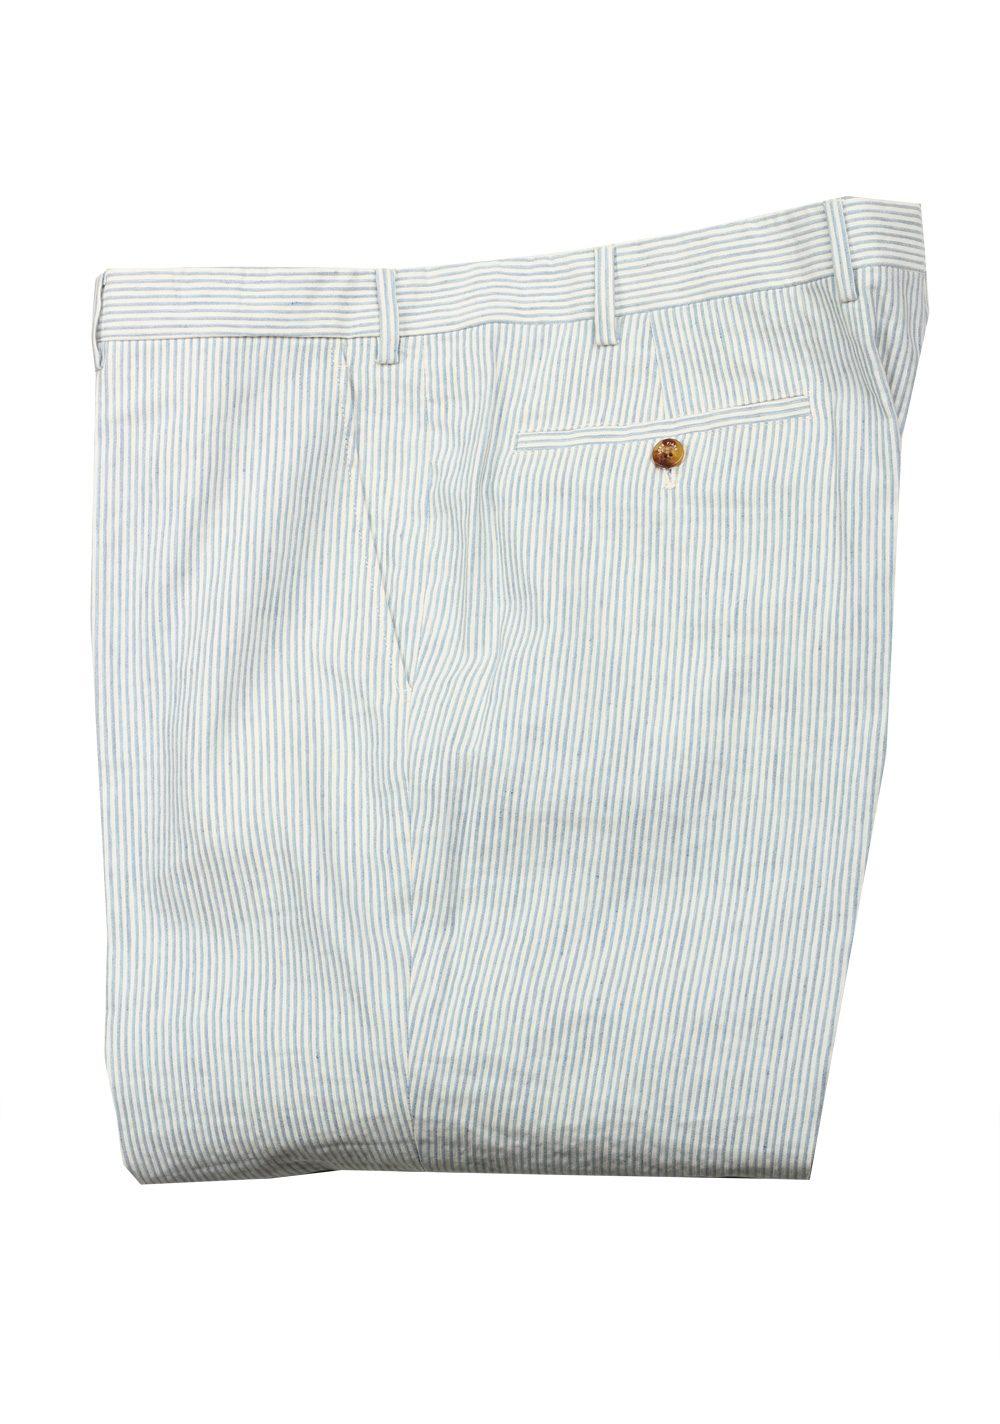 Loro Piana Blue White Striped Trousers Size 58 / 42 U.S. | Costume Limité